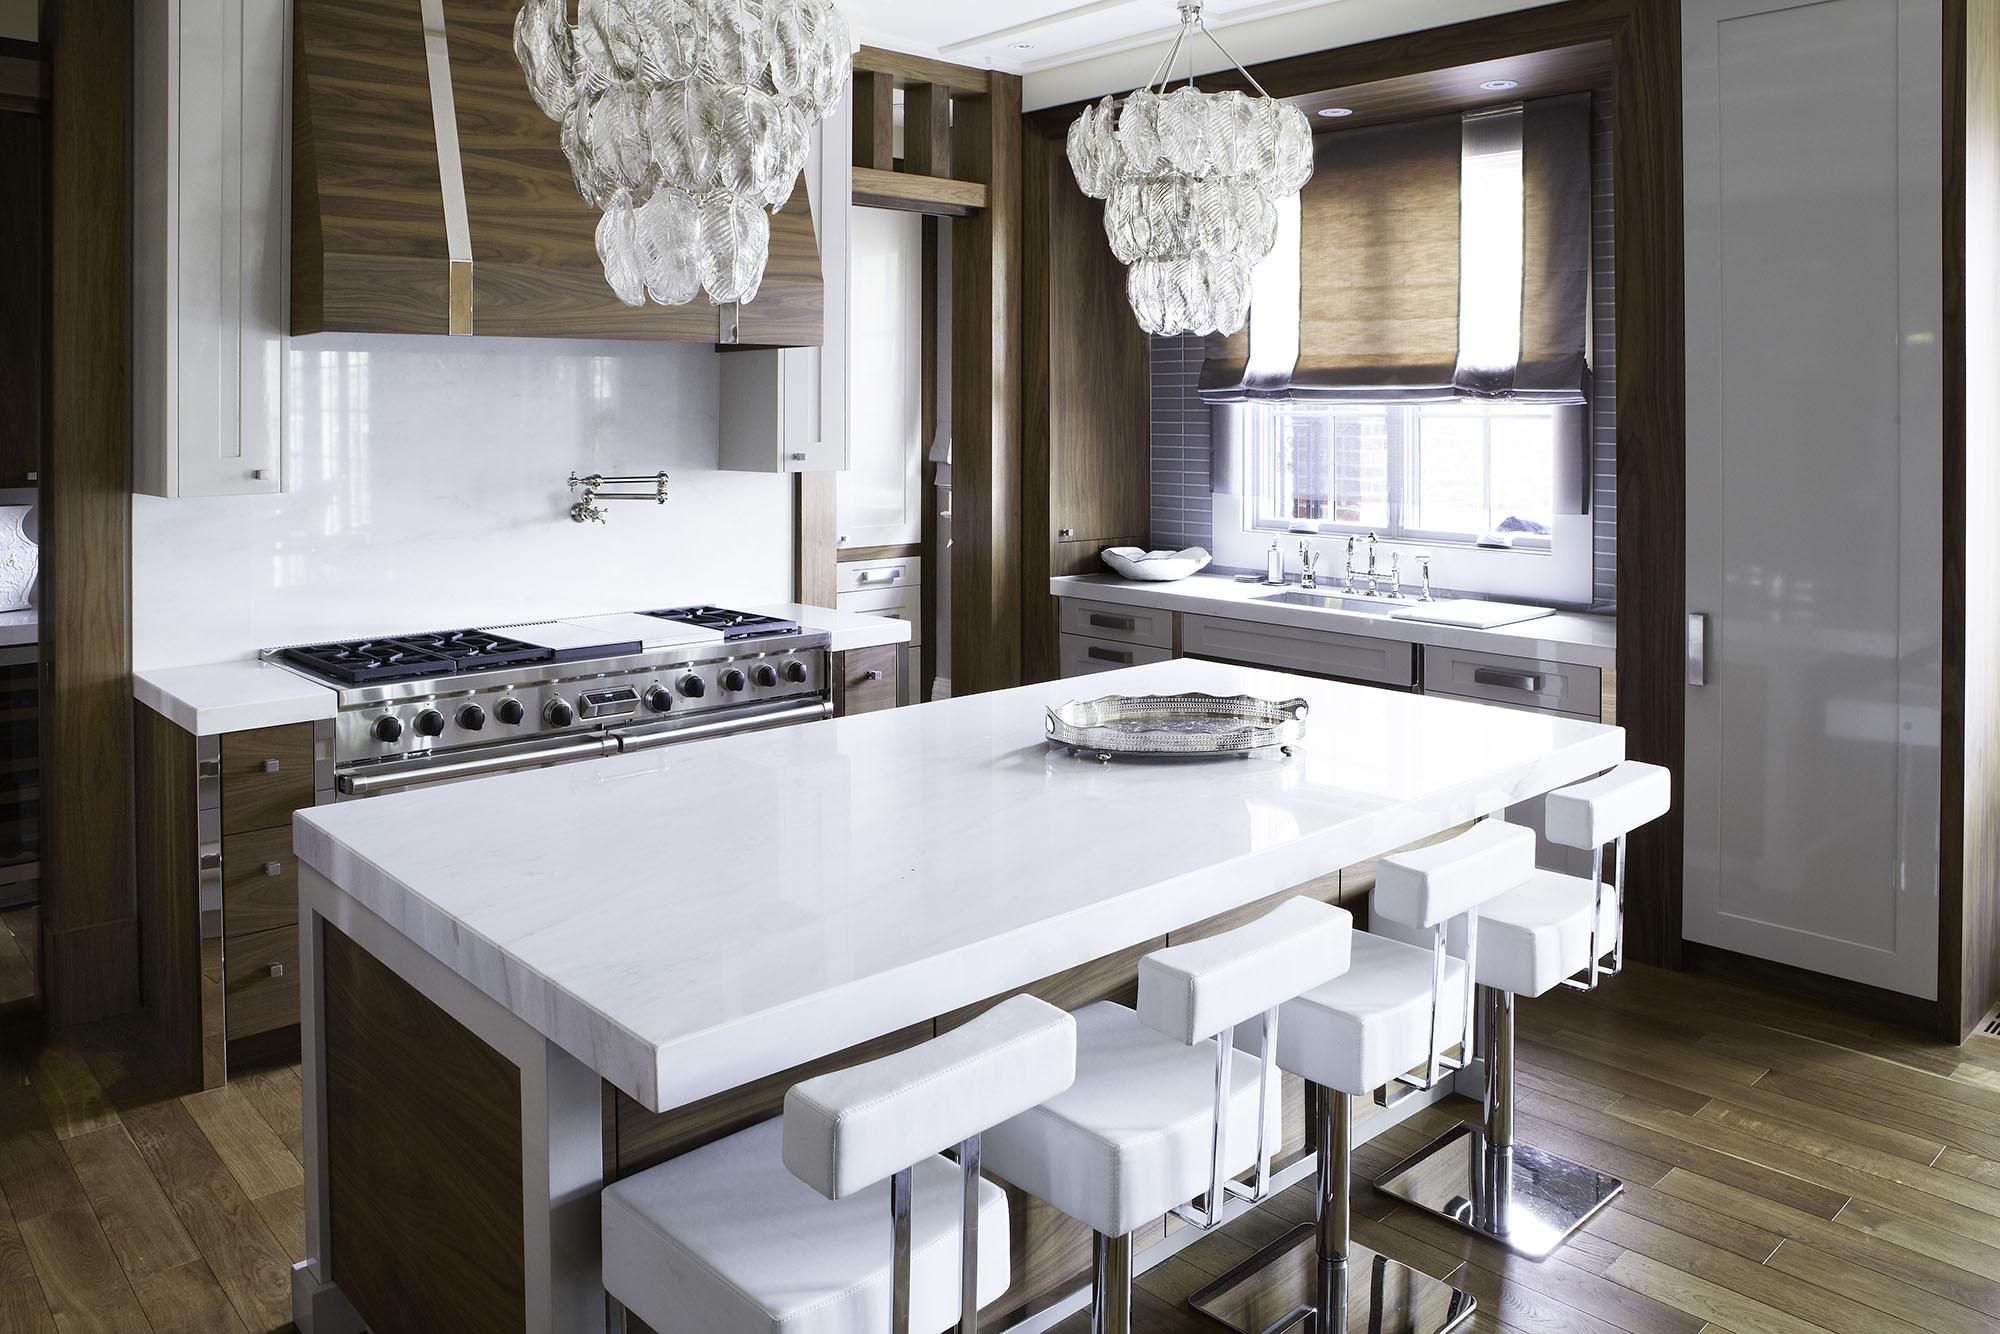 countertops kitchen white stools granite marble toronto cm quartz crown